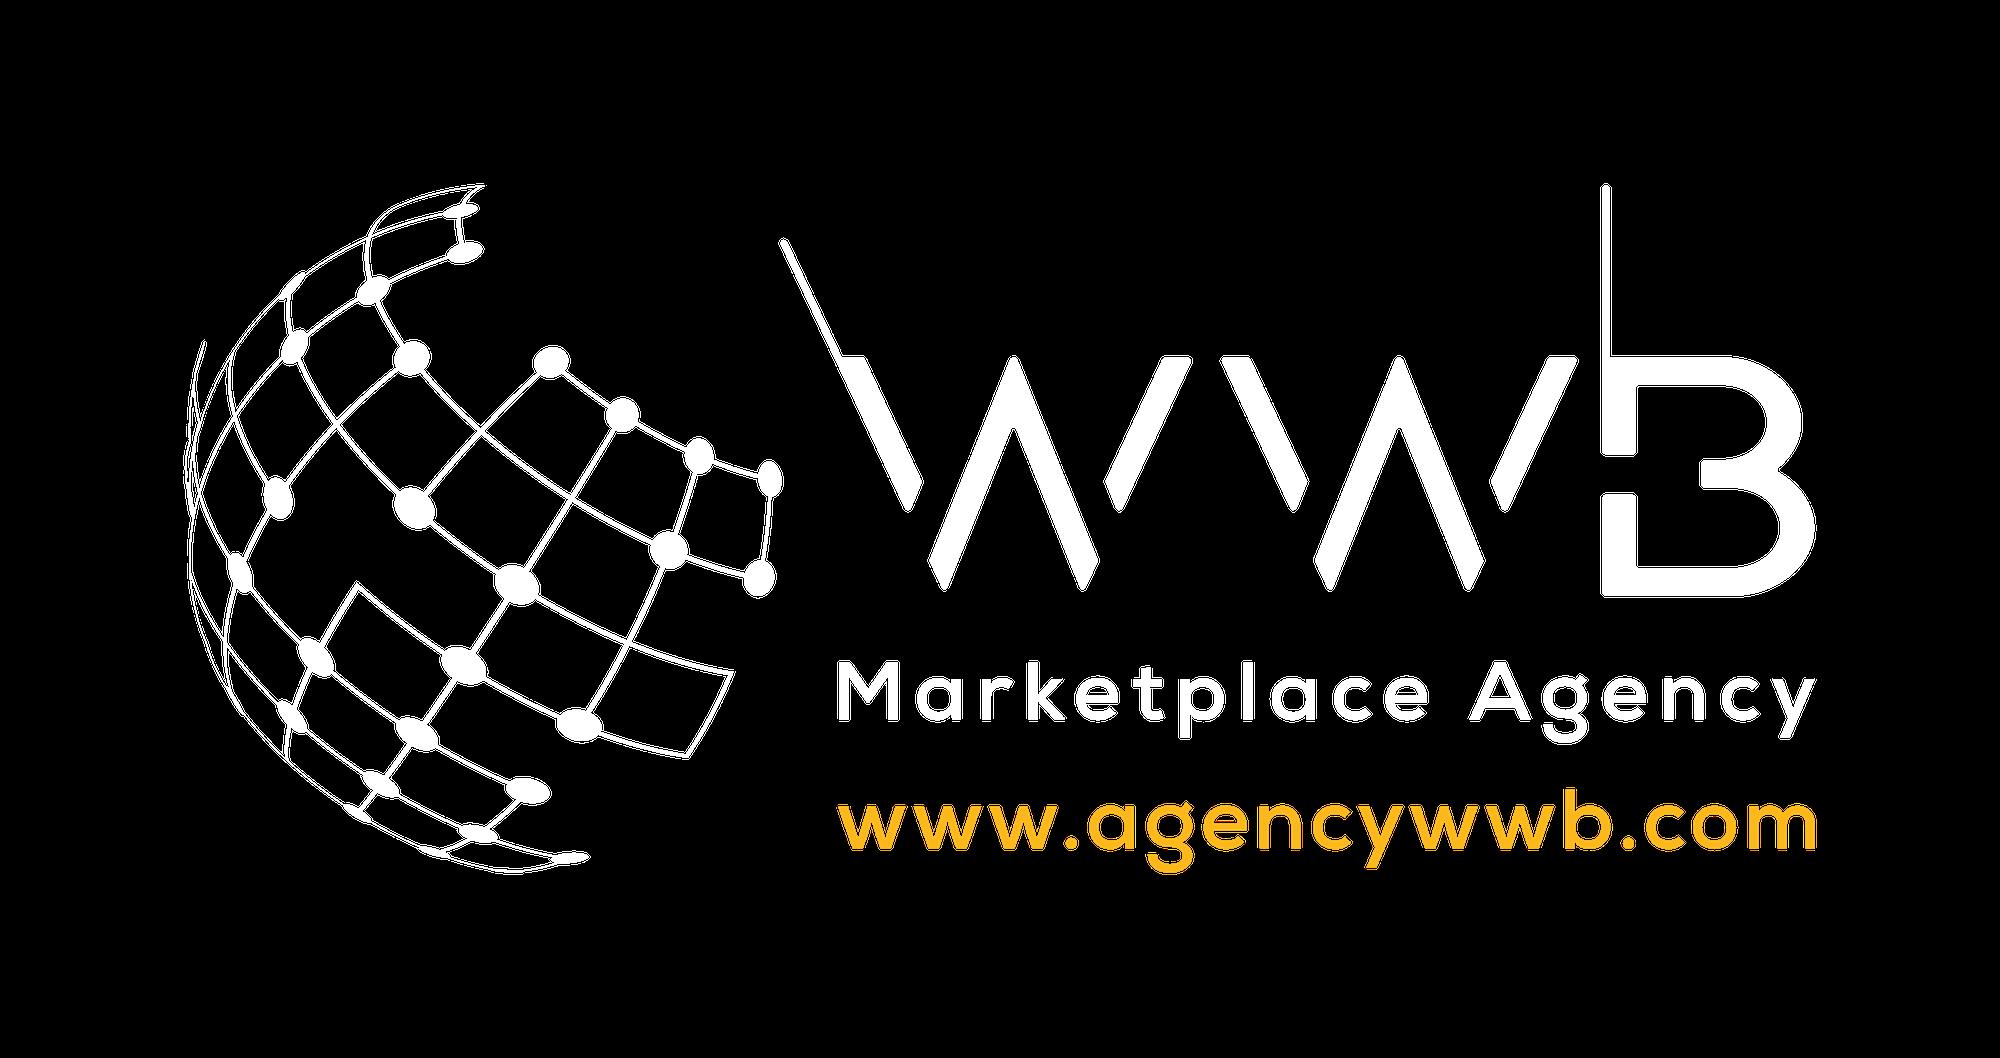 Agency WWB